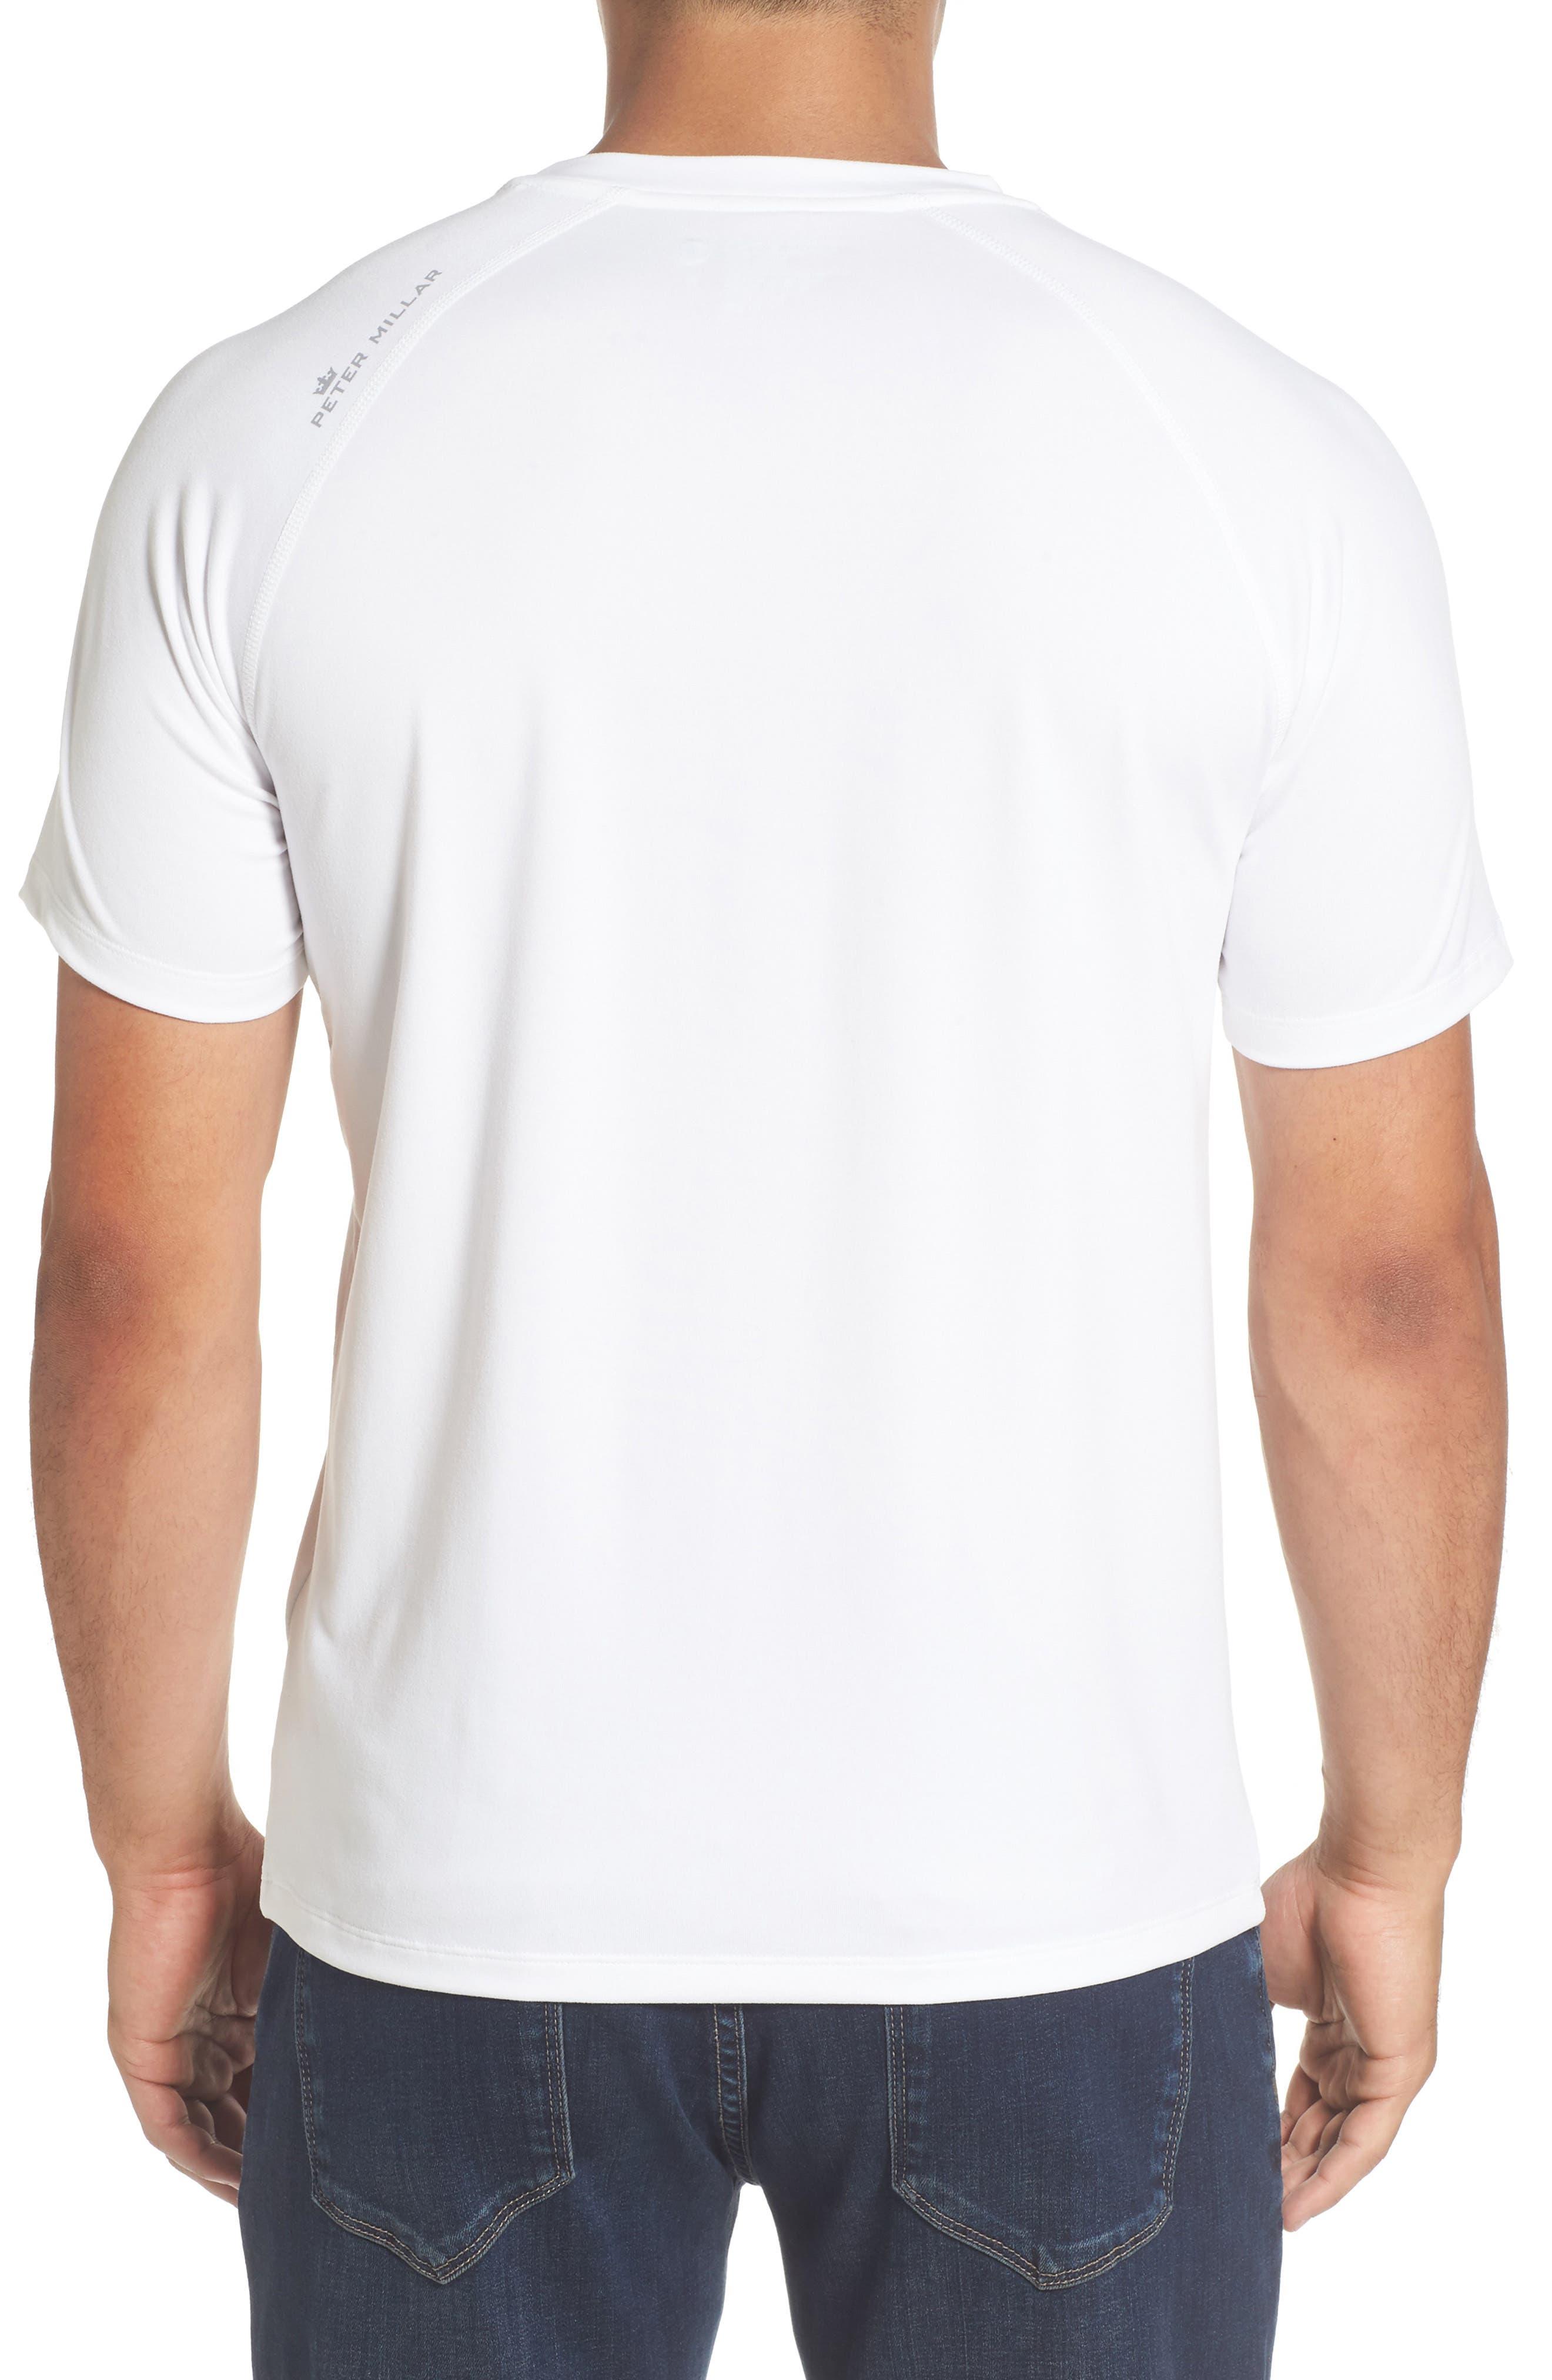 Rio Technical T-Shirt,                             Alternate thumbnail 2, color,                             White